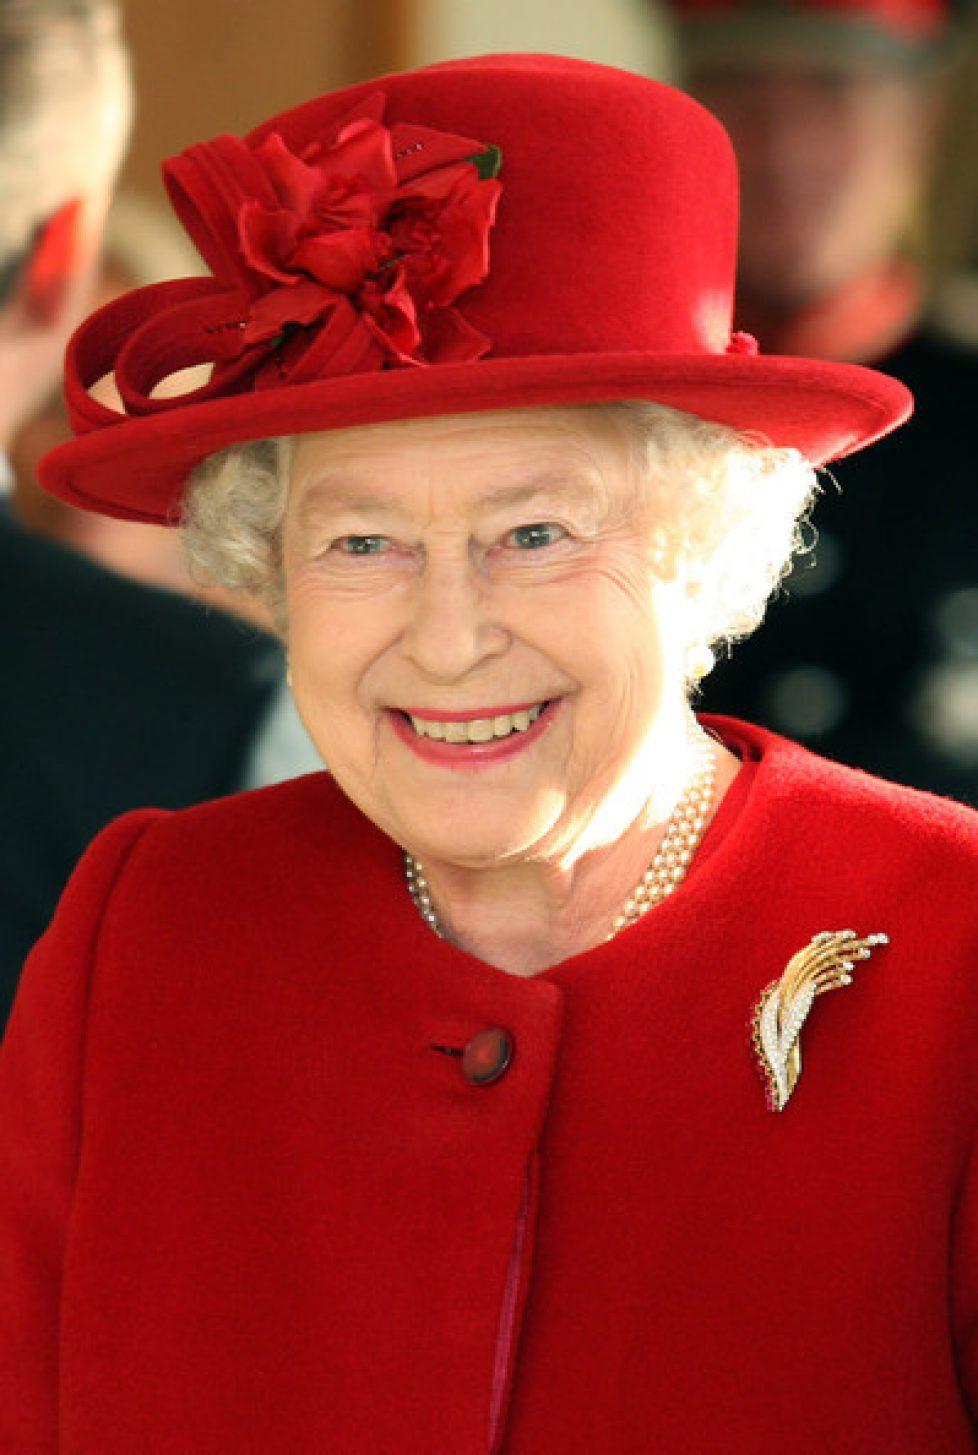 Queen+Visits+Newmarket+Animal+Health+Trust+LMXeiUHdiDwl